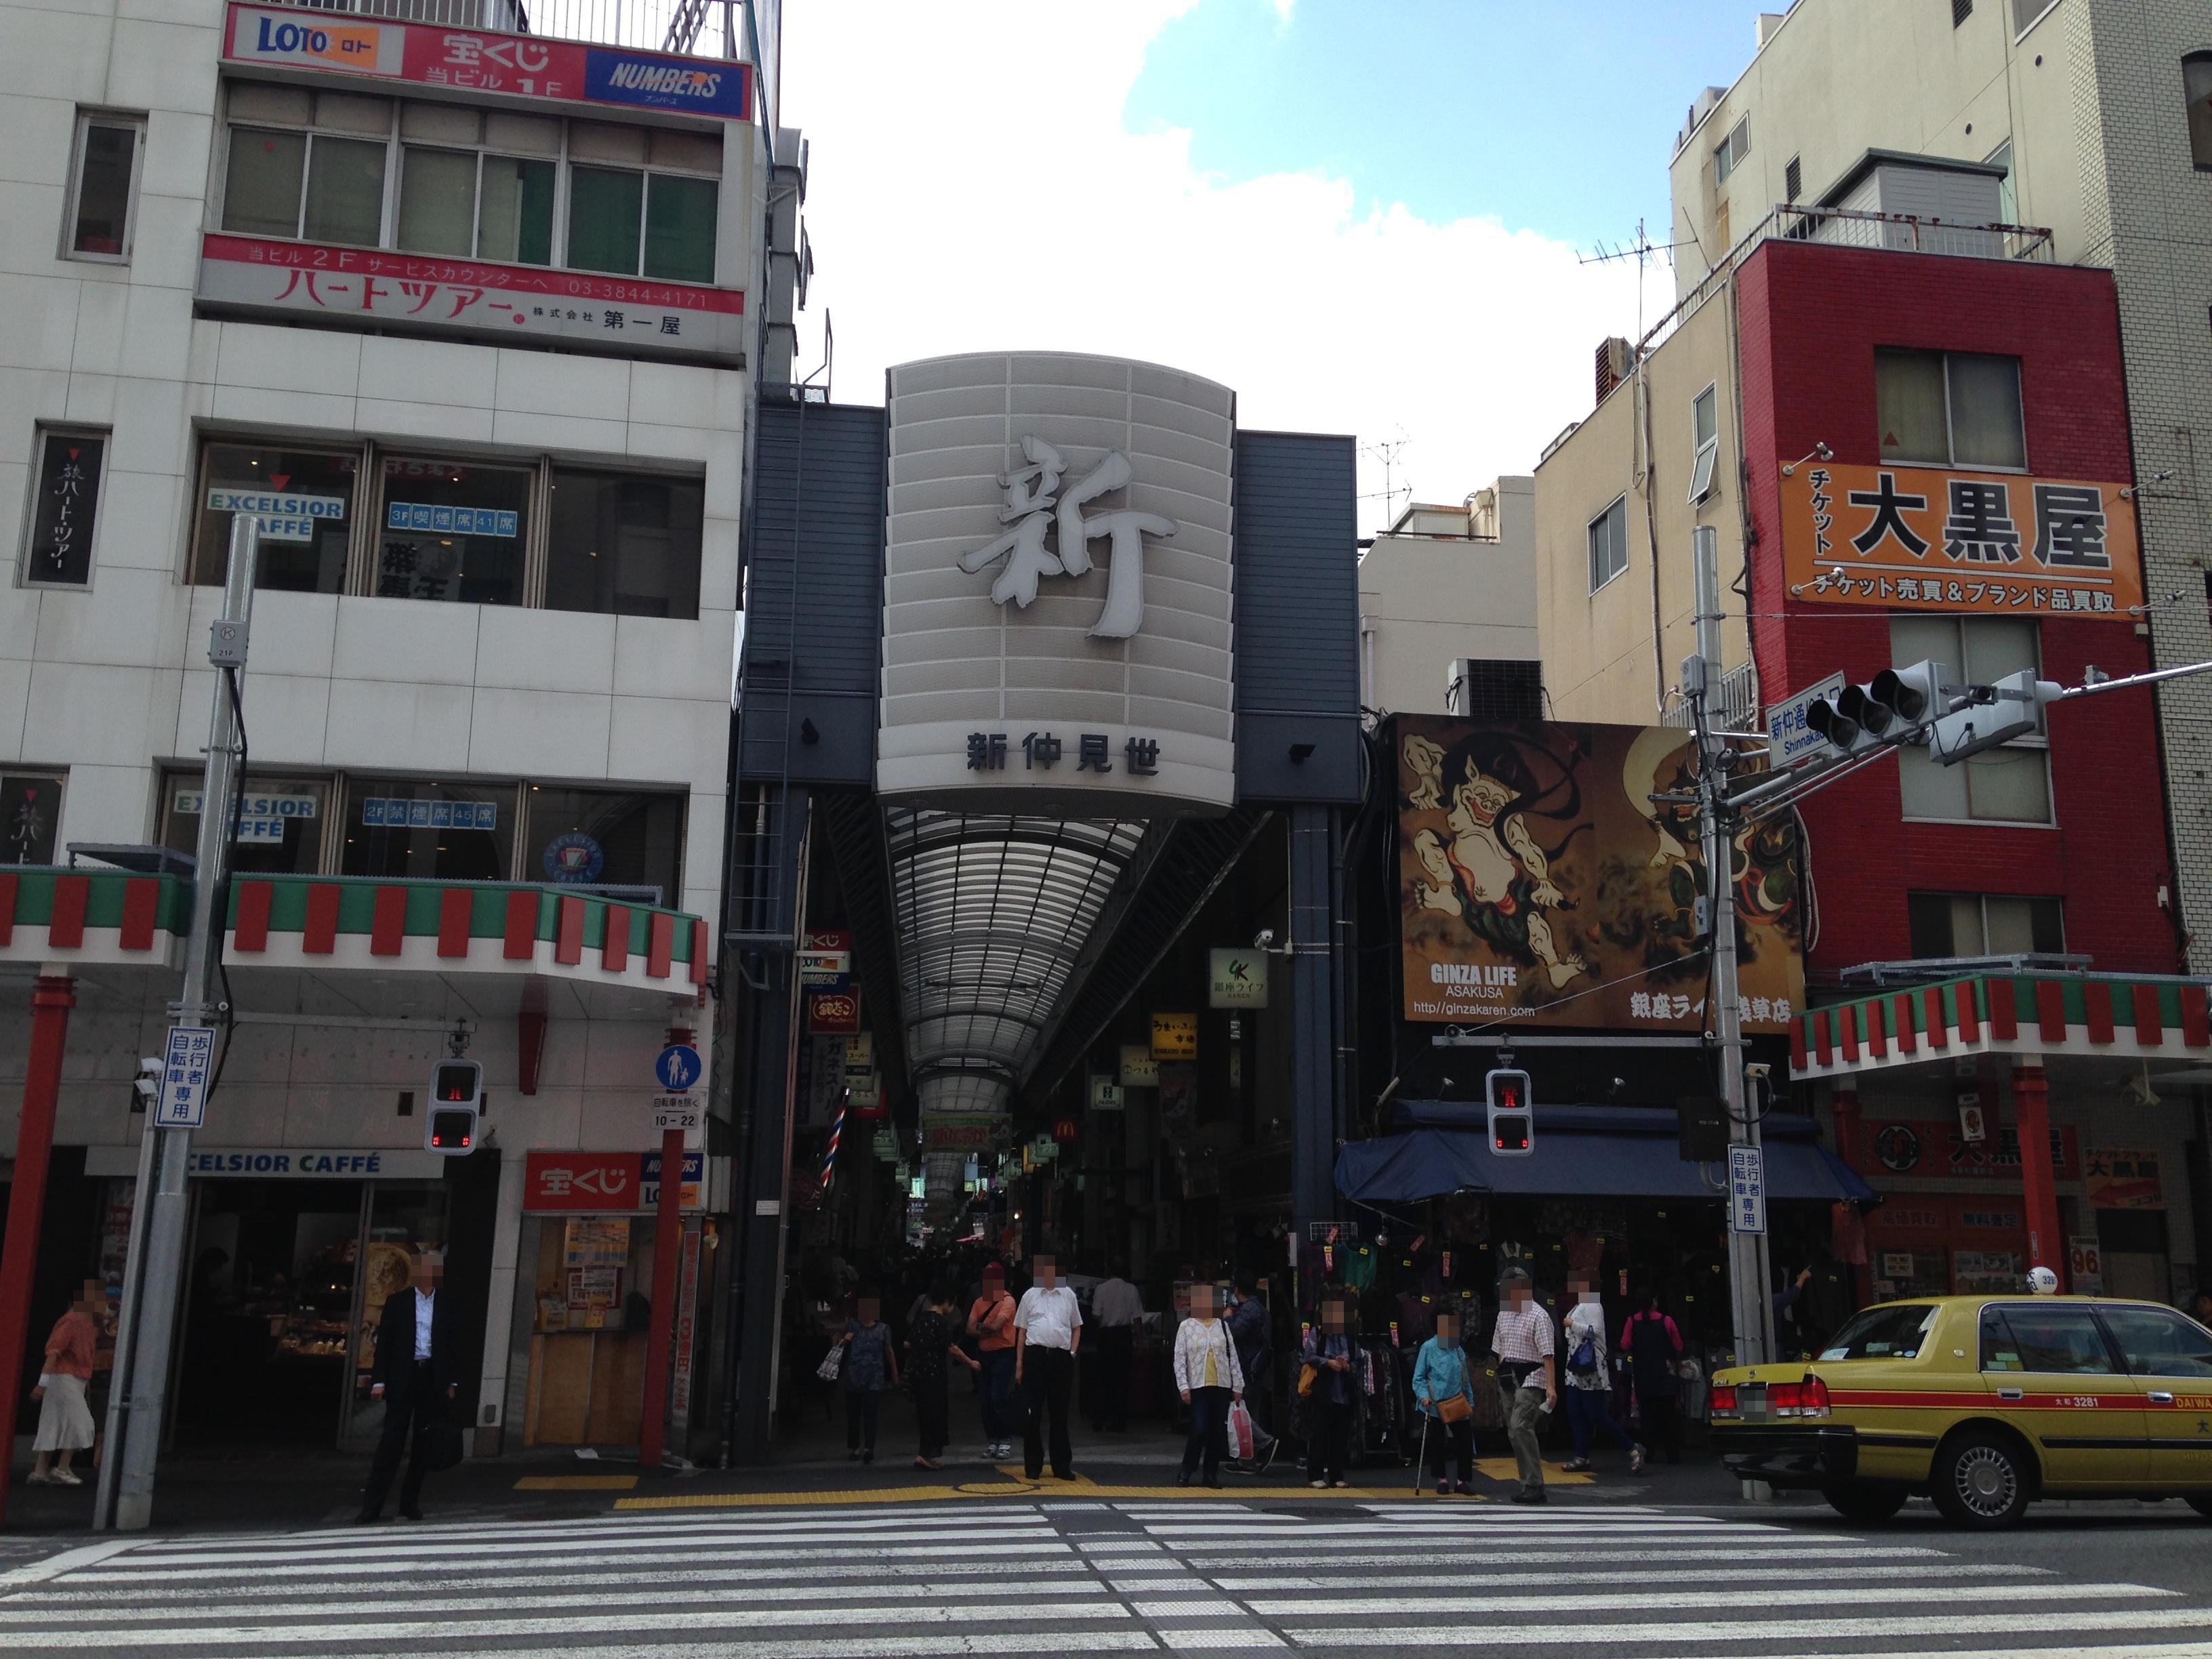 East_entrance_of_Shin-Nakamise_Shopping_Area